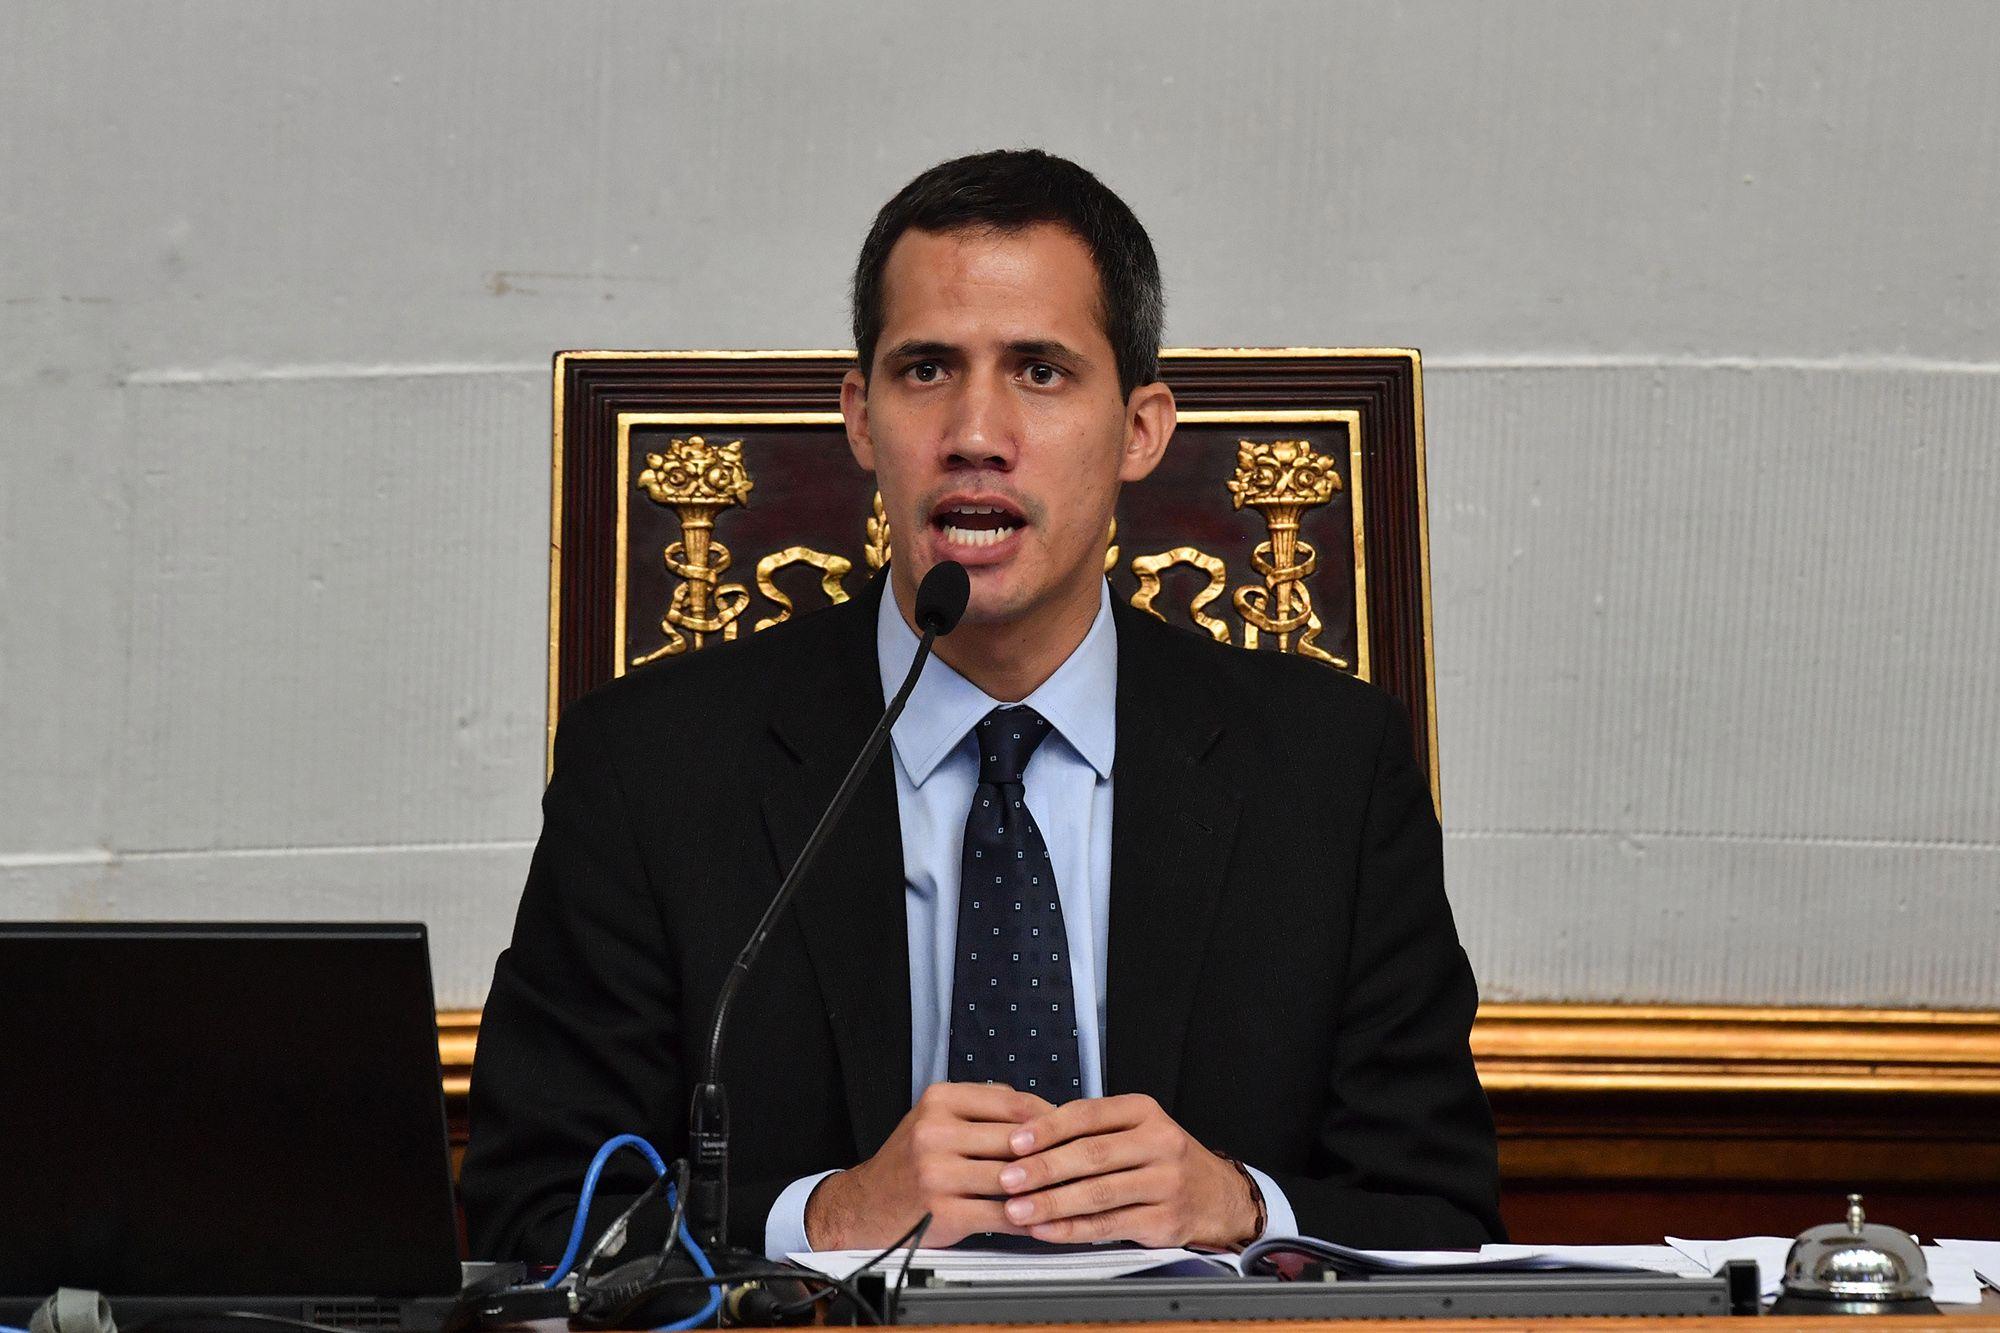 Delegación noruega visitará Venezuela pero Guaidó rechaza reabrir diálogos